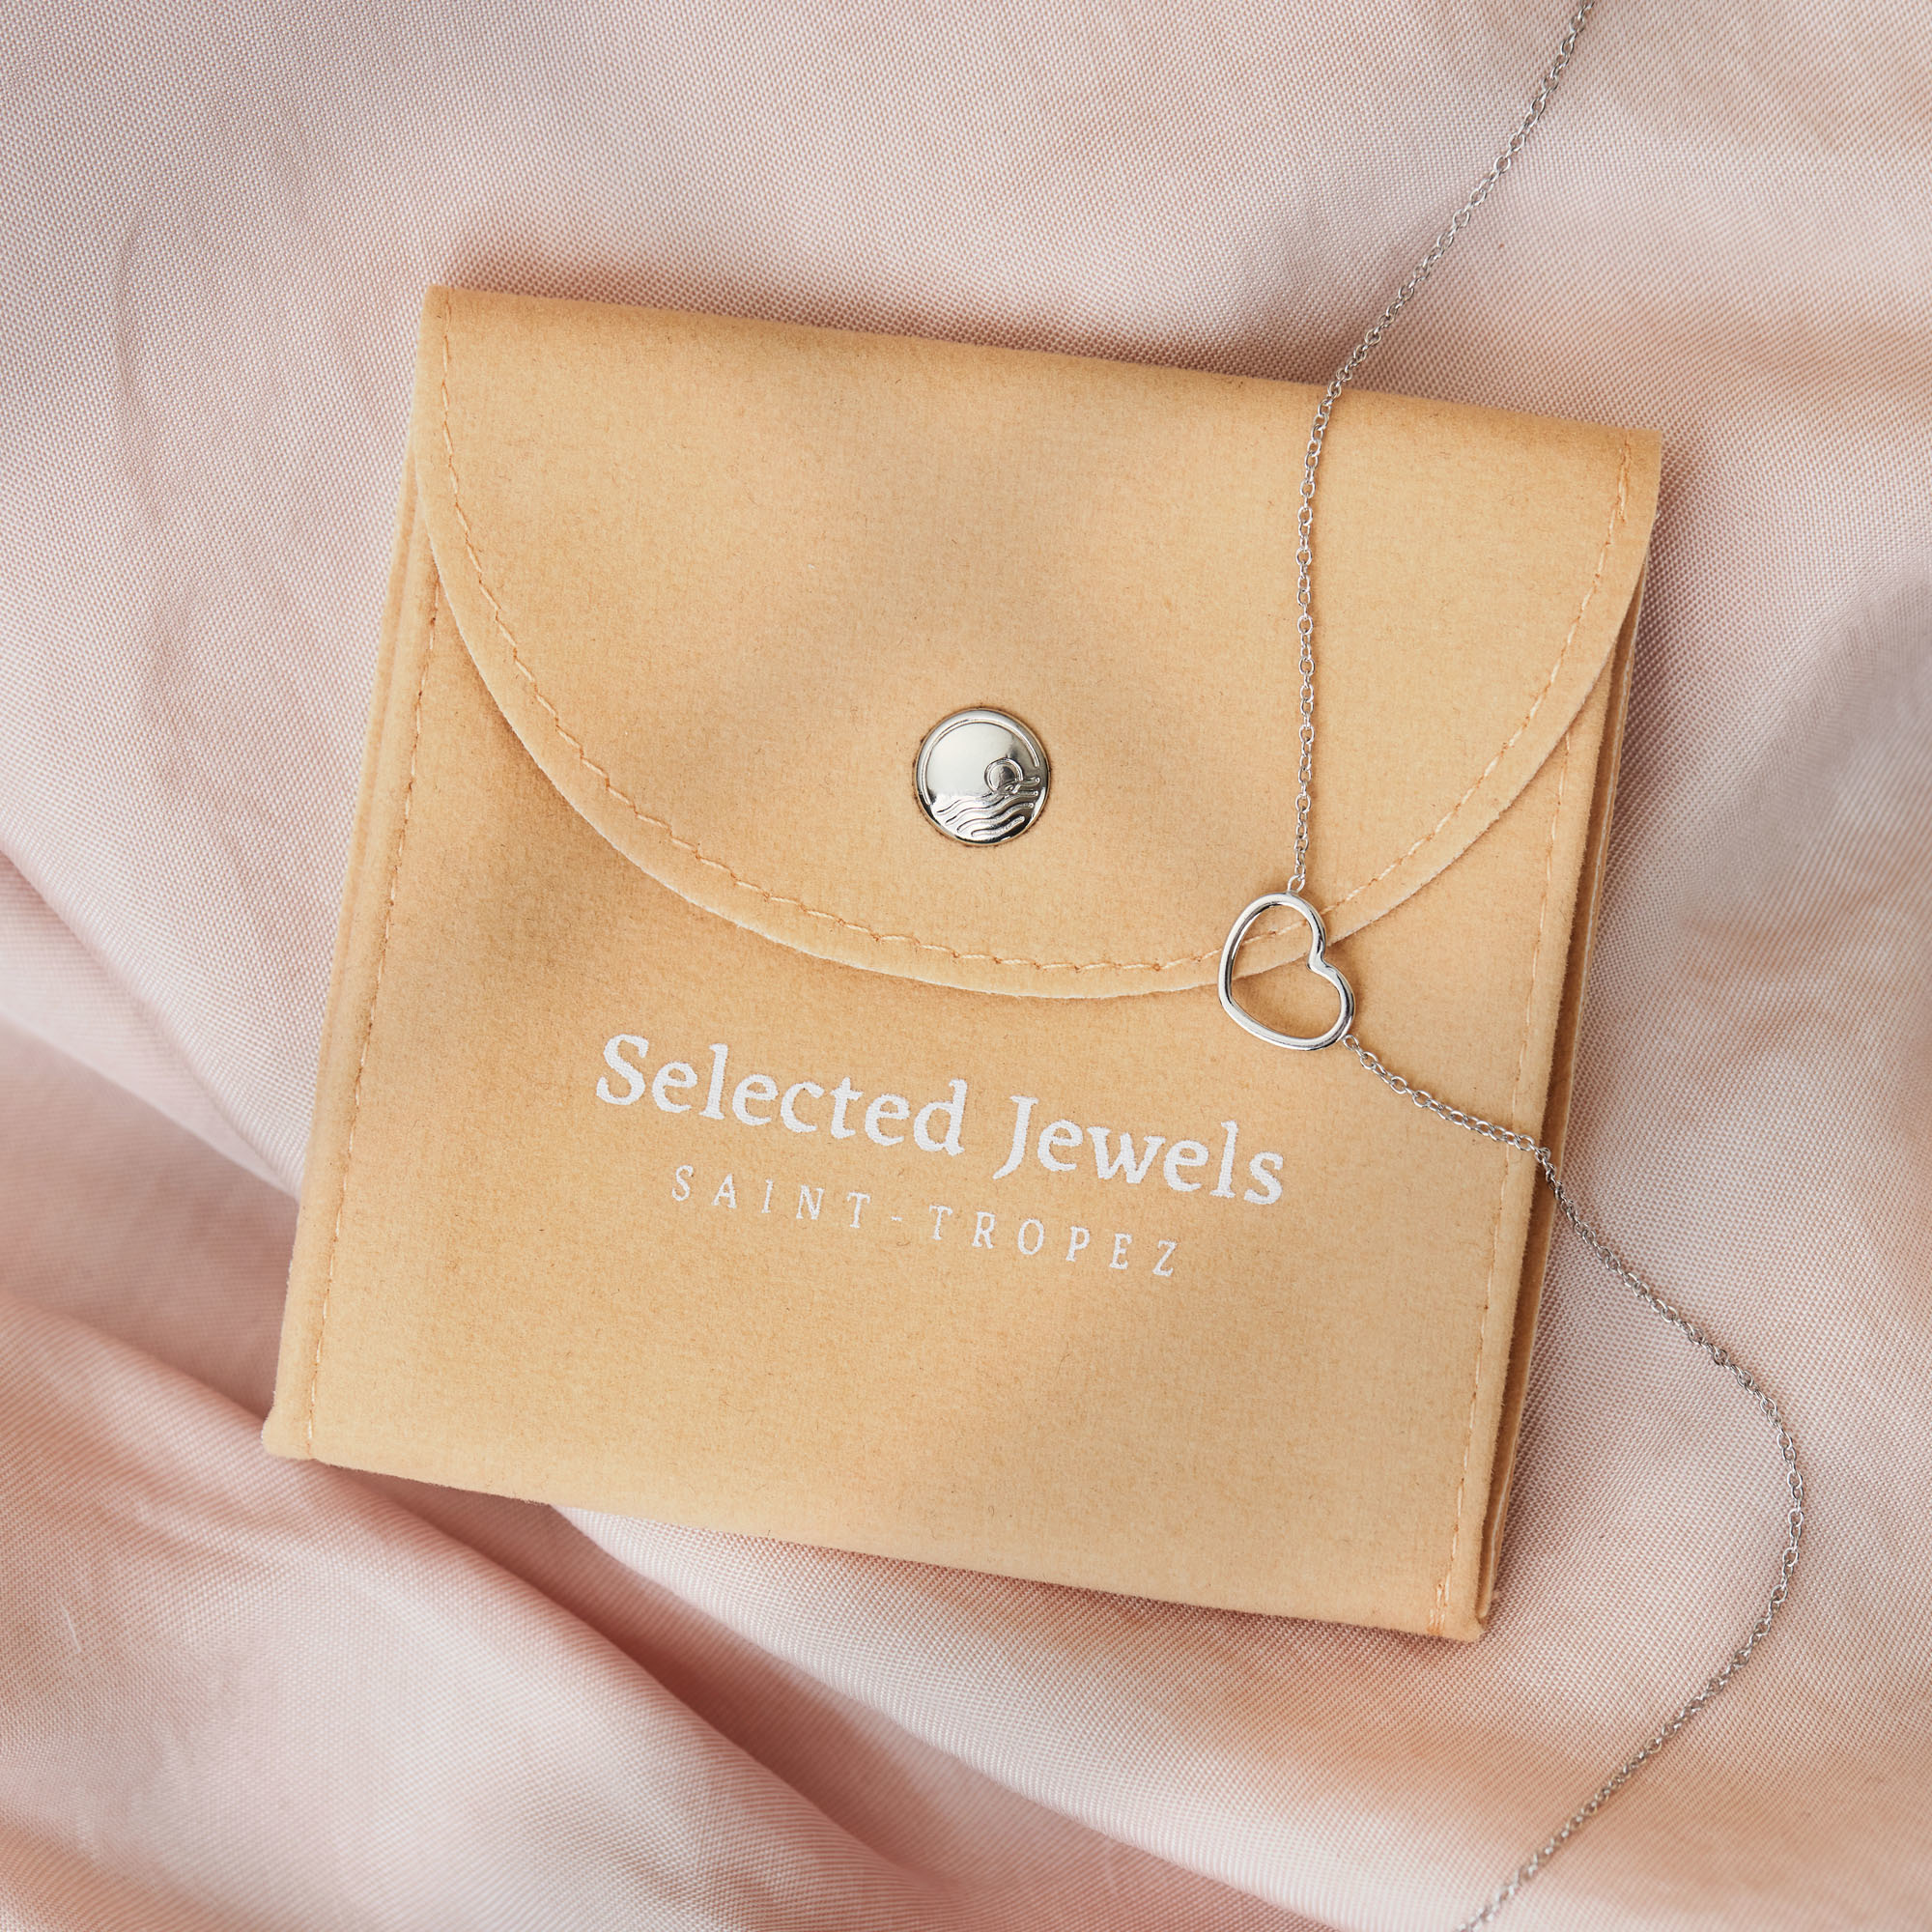 Selected Jewels Julie Chloé 925 sterling zilveren initial armband met letter